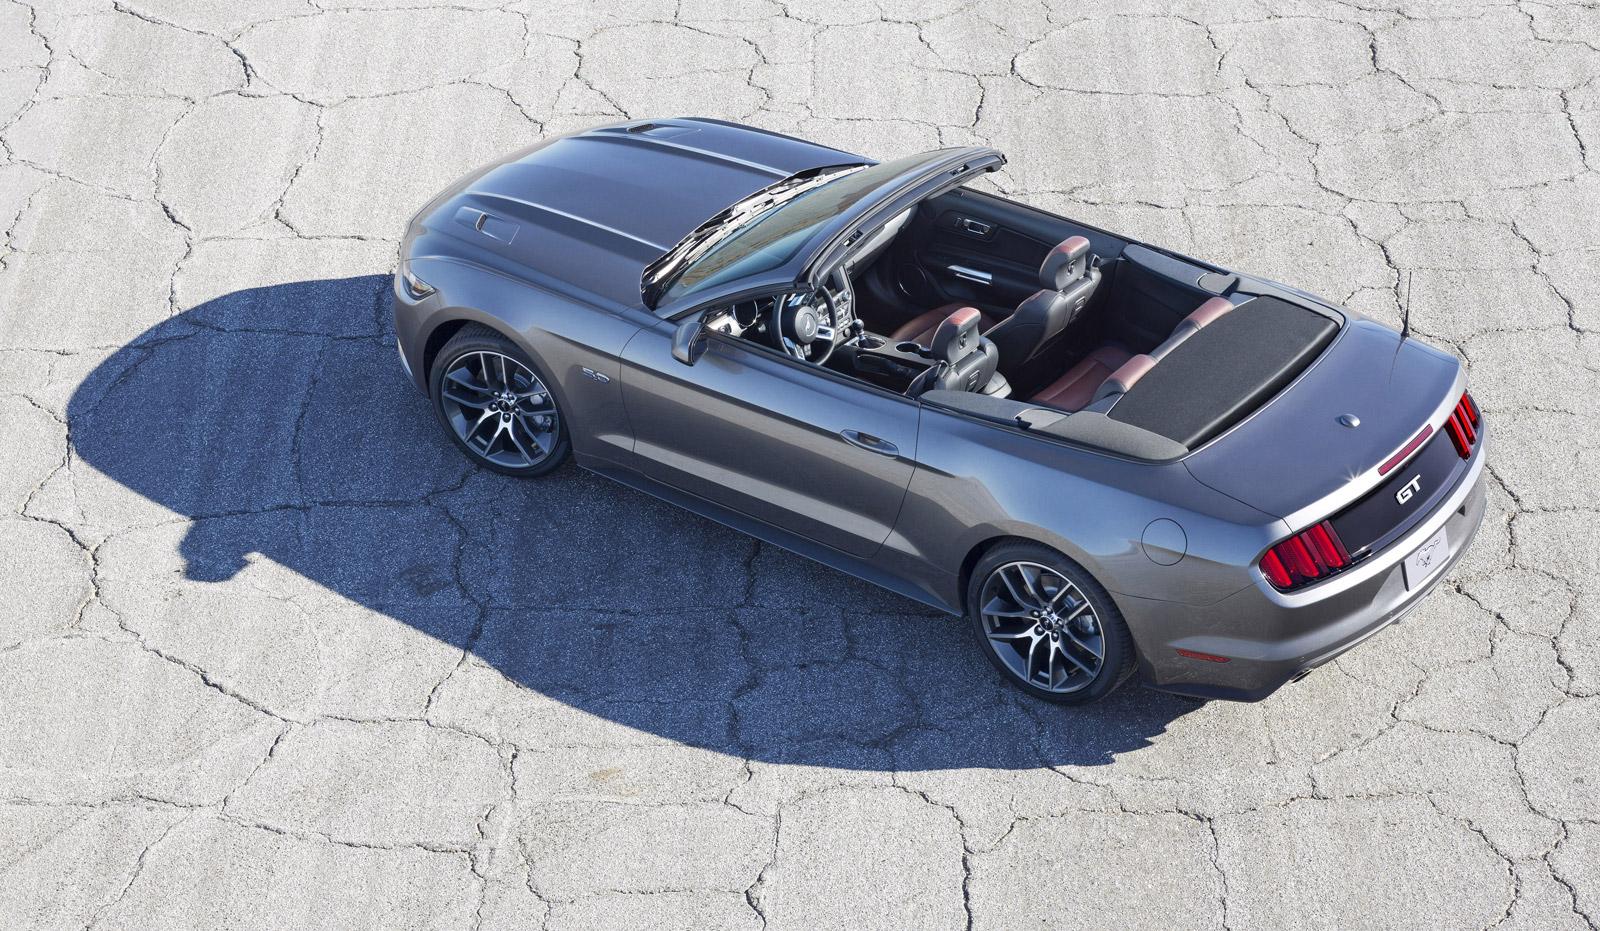 2015 Jeep Renegade 2015 Mustang Convertible Apple